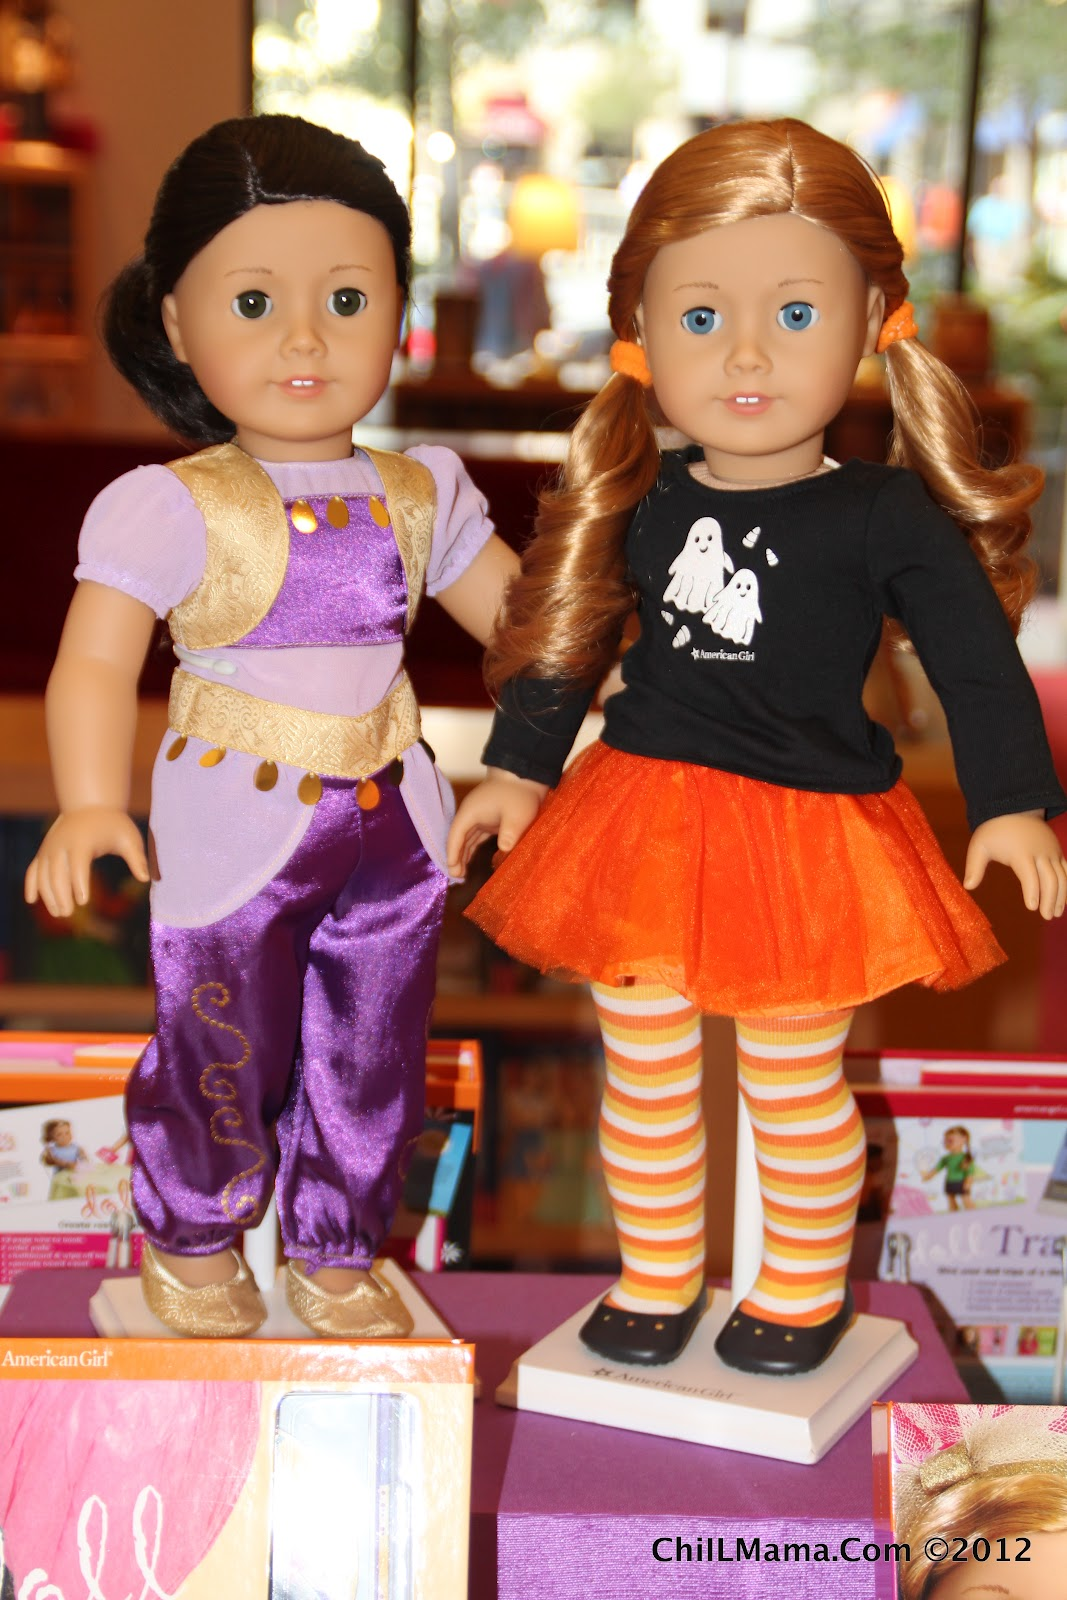 chiil mama: halloween fun with american girl, monster cake & more